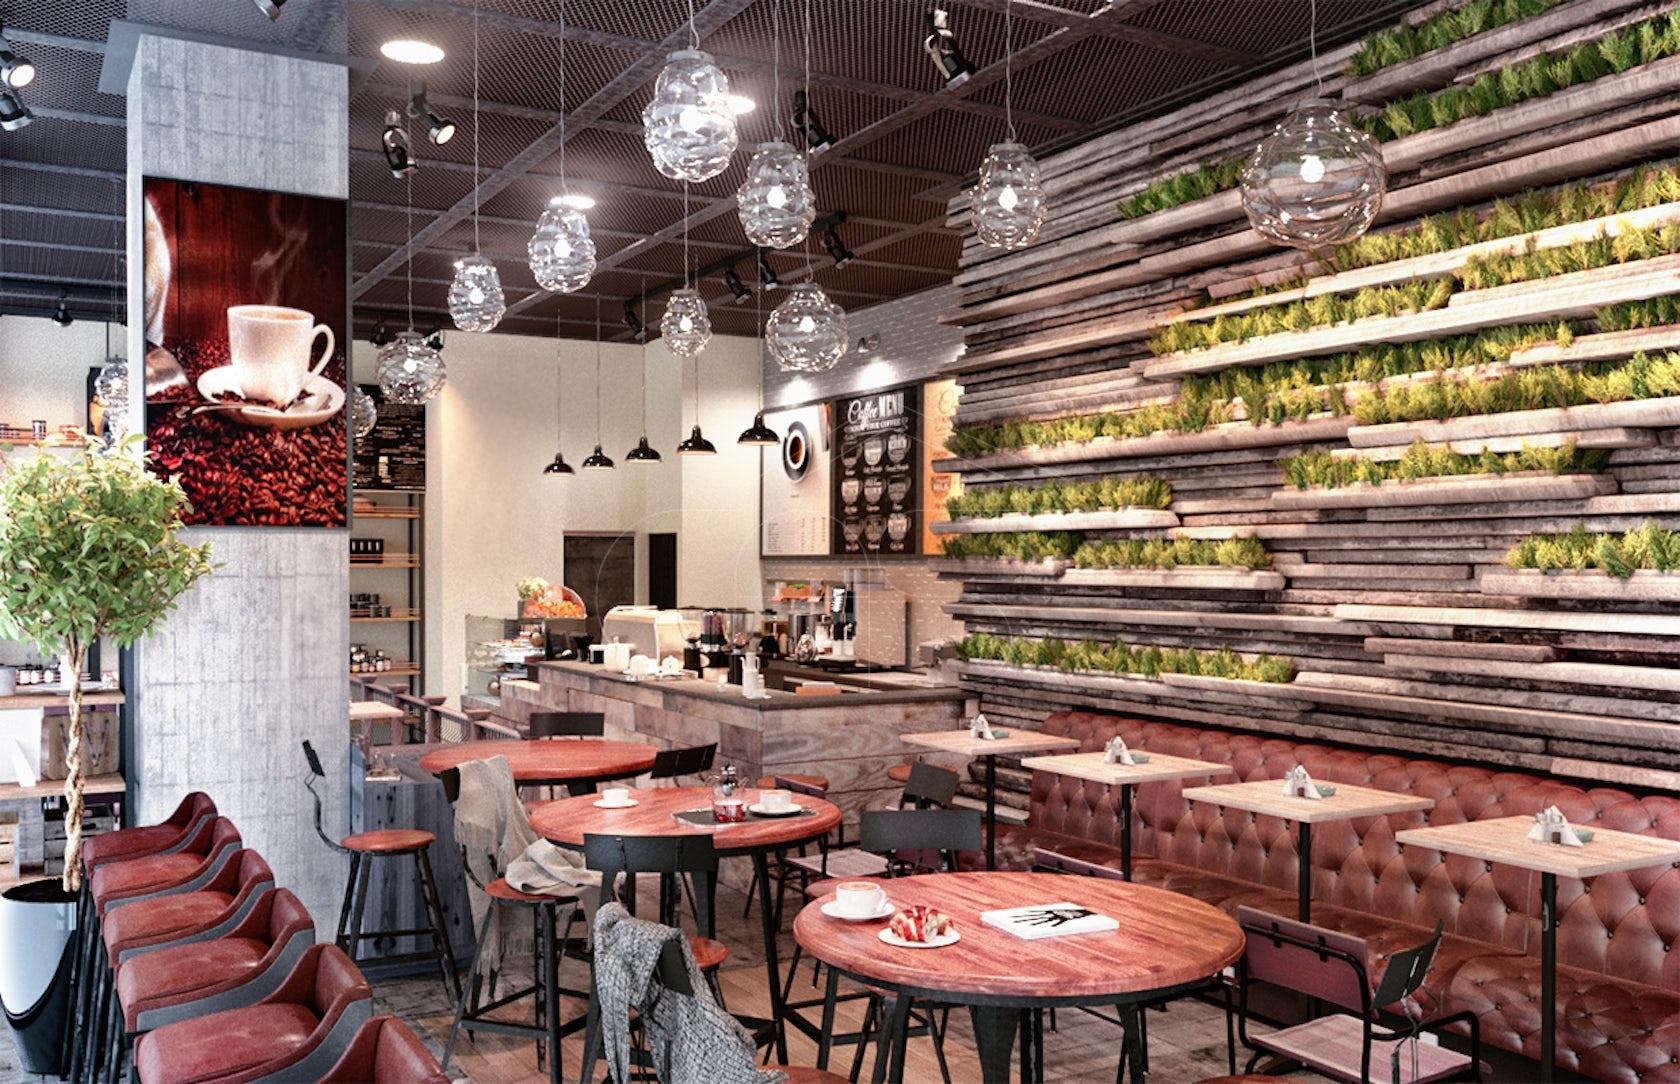 INDUSTRIAL RUSTIC CAFÉ INTERIOR DESIGN - Architizer